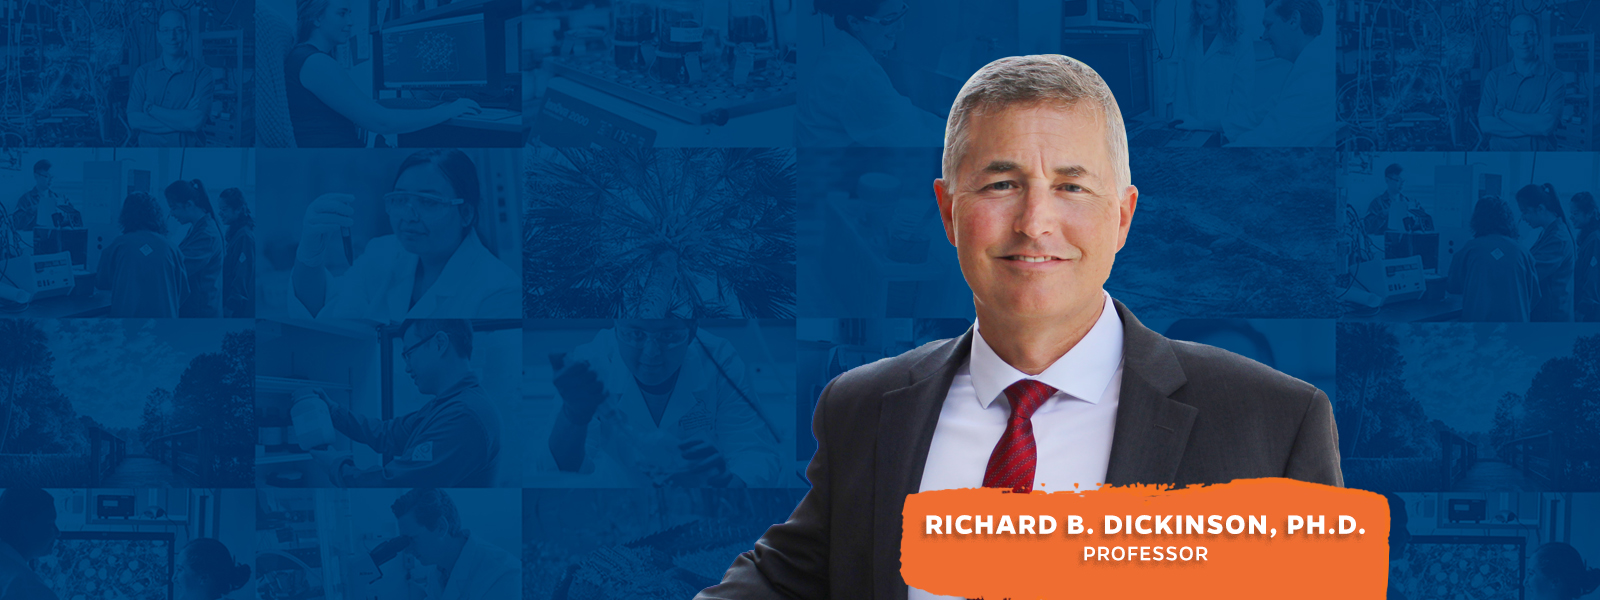 Richard B. Dickinson, Ph.D.